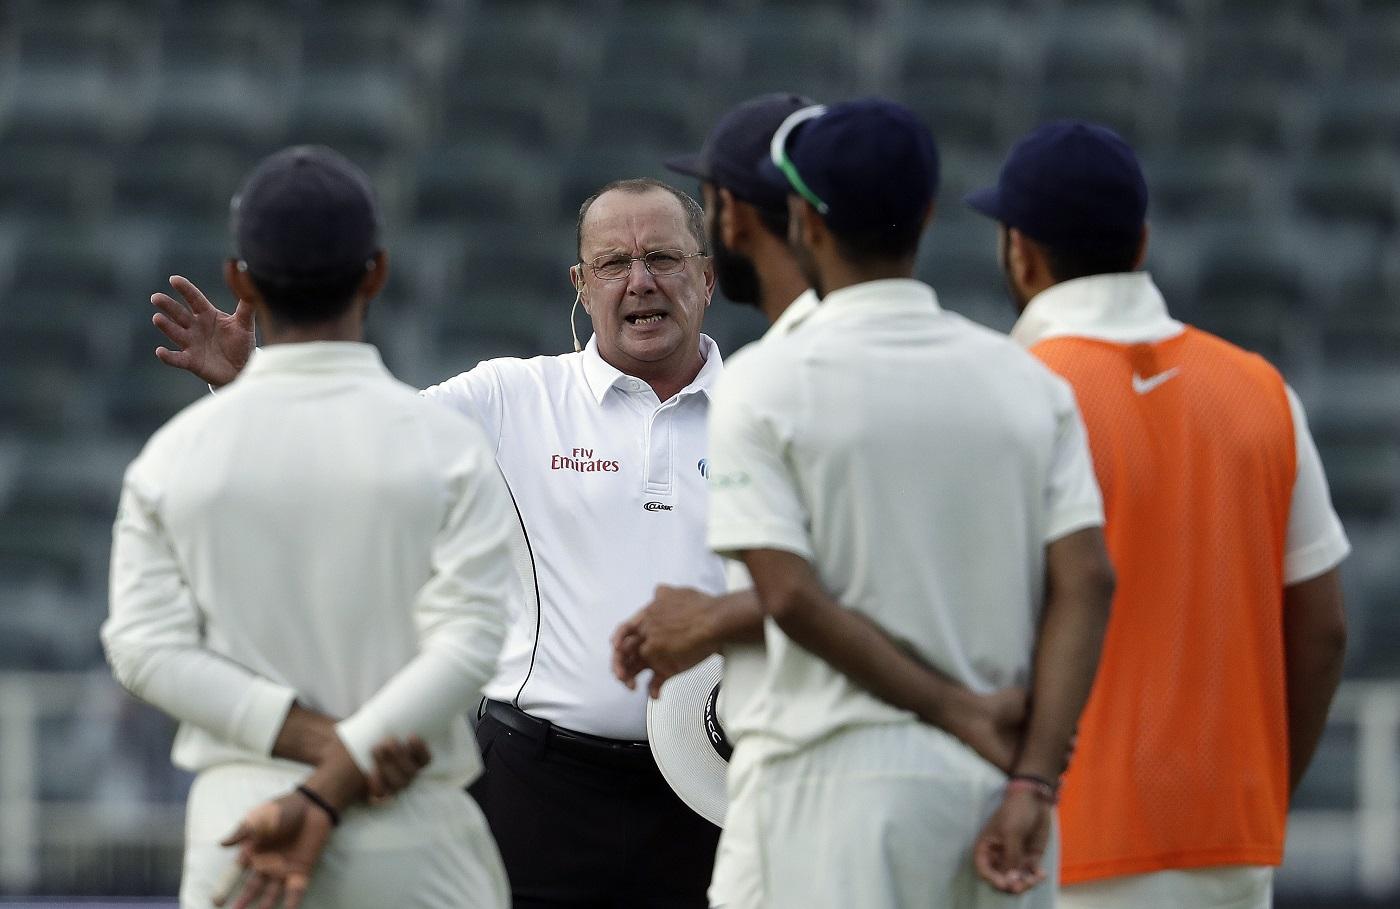 SA vs IND 2018: Match Must Go On ICC, Says Harbhajan Singh As He Slams South Africa